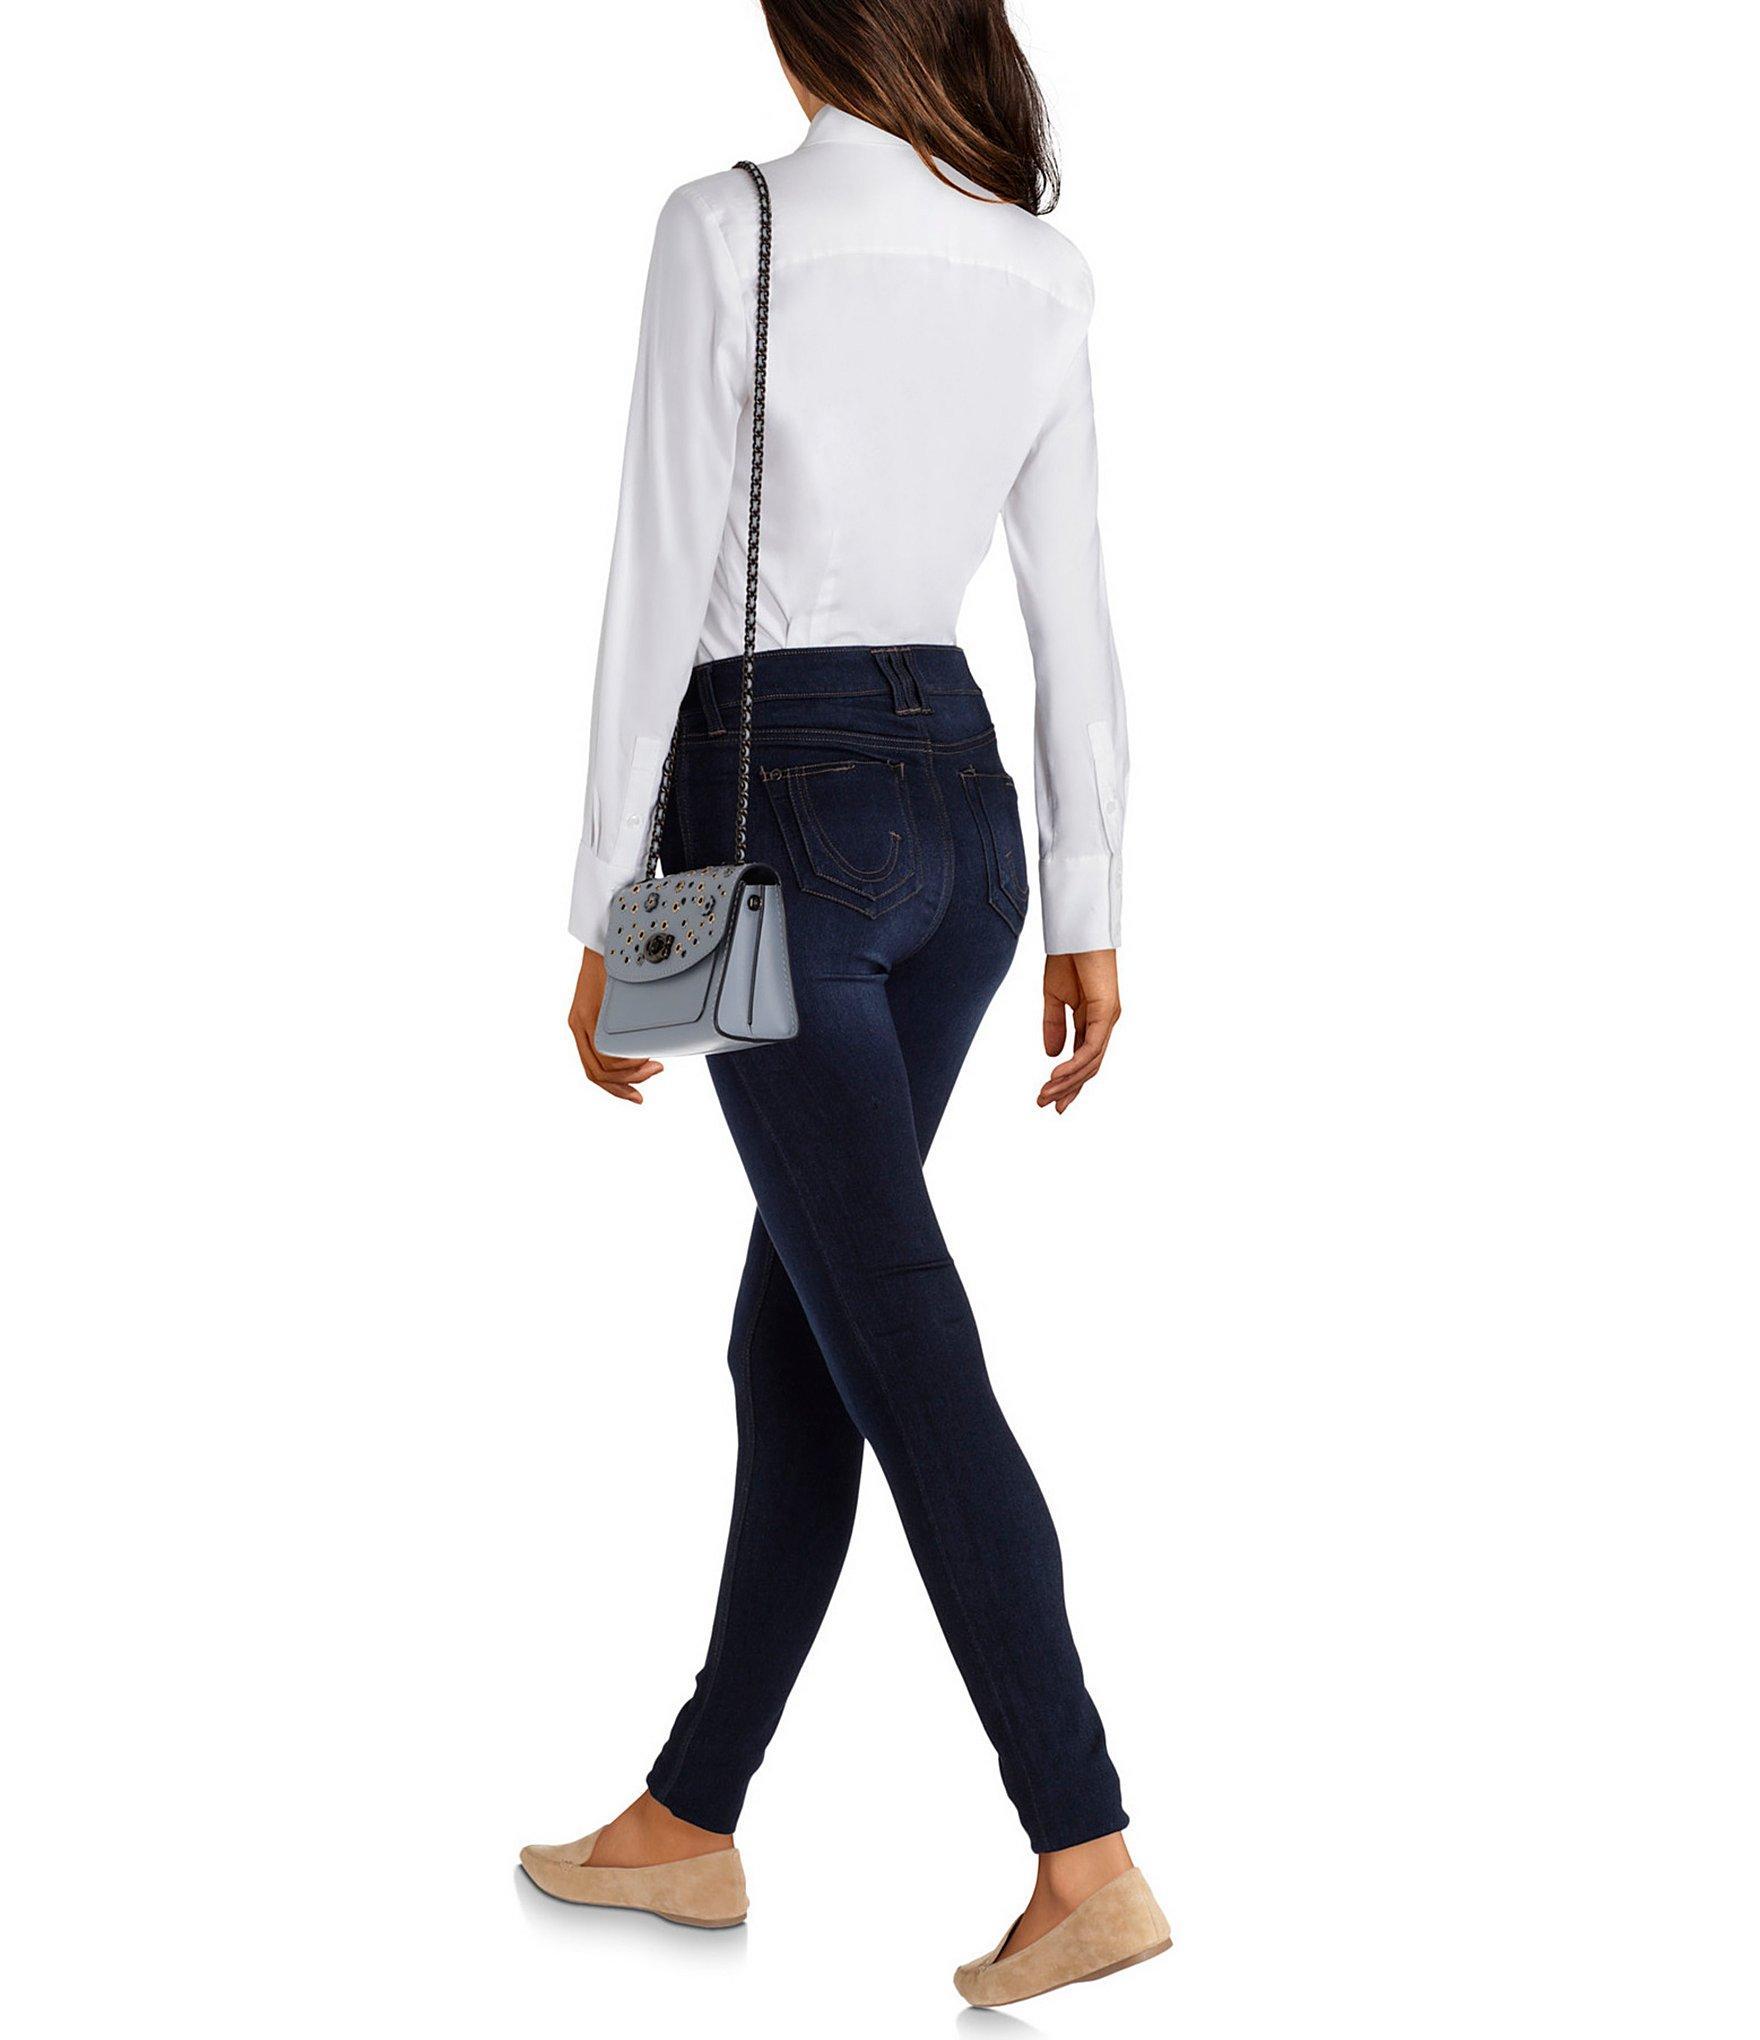 86e5d5ea65 Women's Blue Parker 18 Scattered Rivets Floral Applique Shoulder Bag